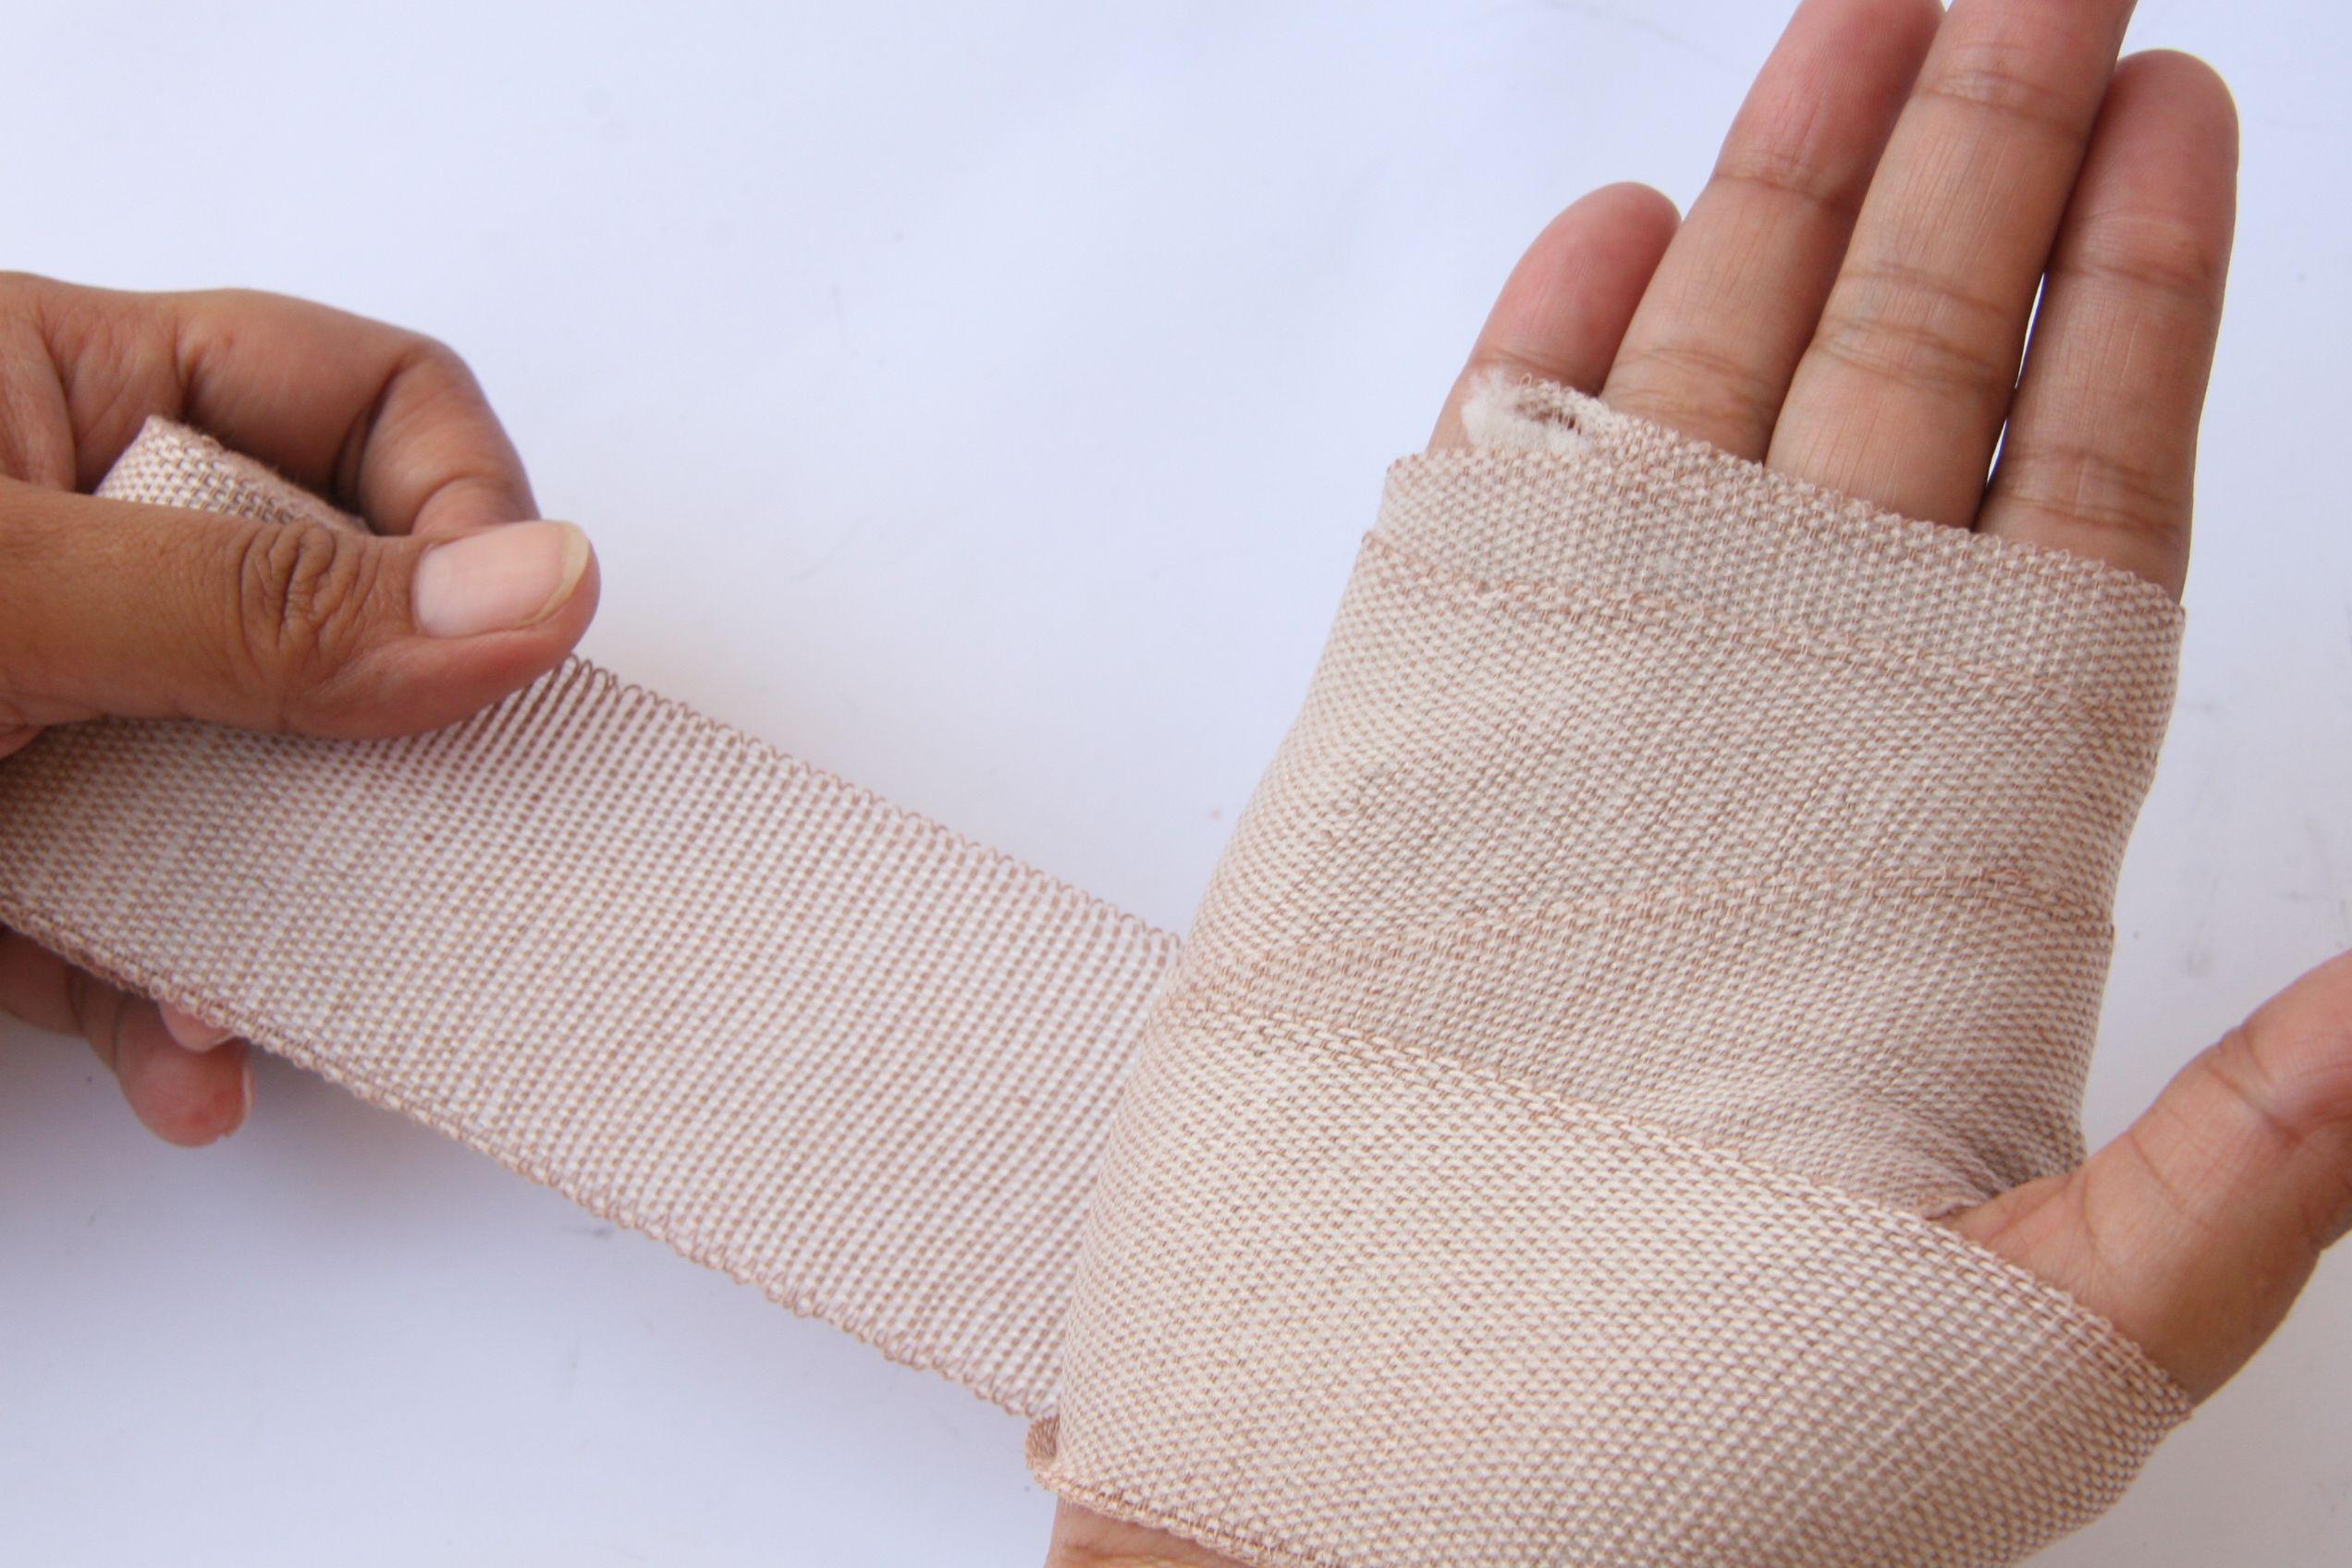 Wrap a Wrist